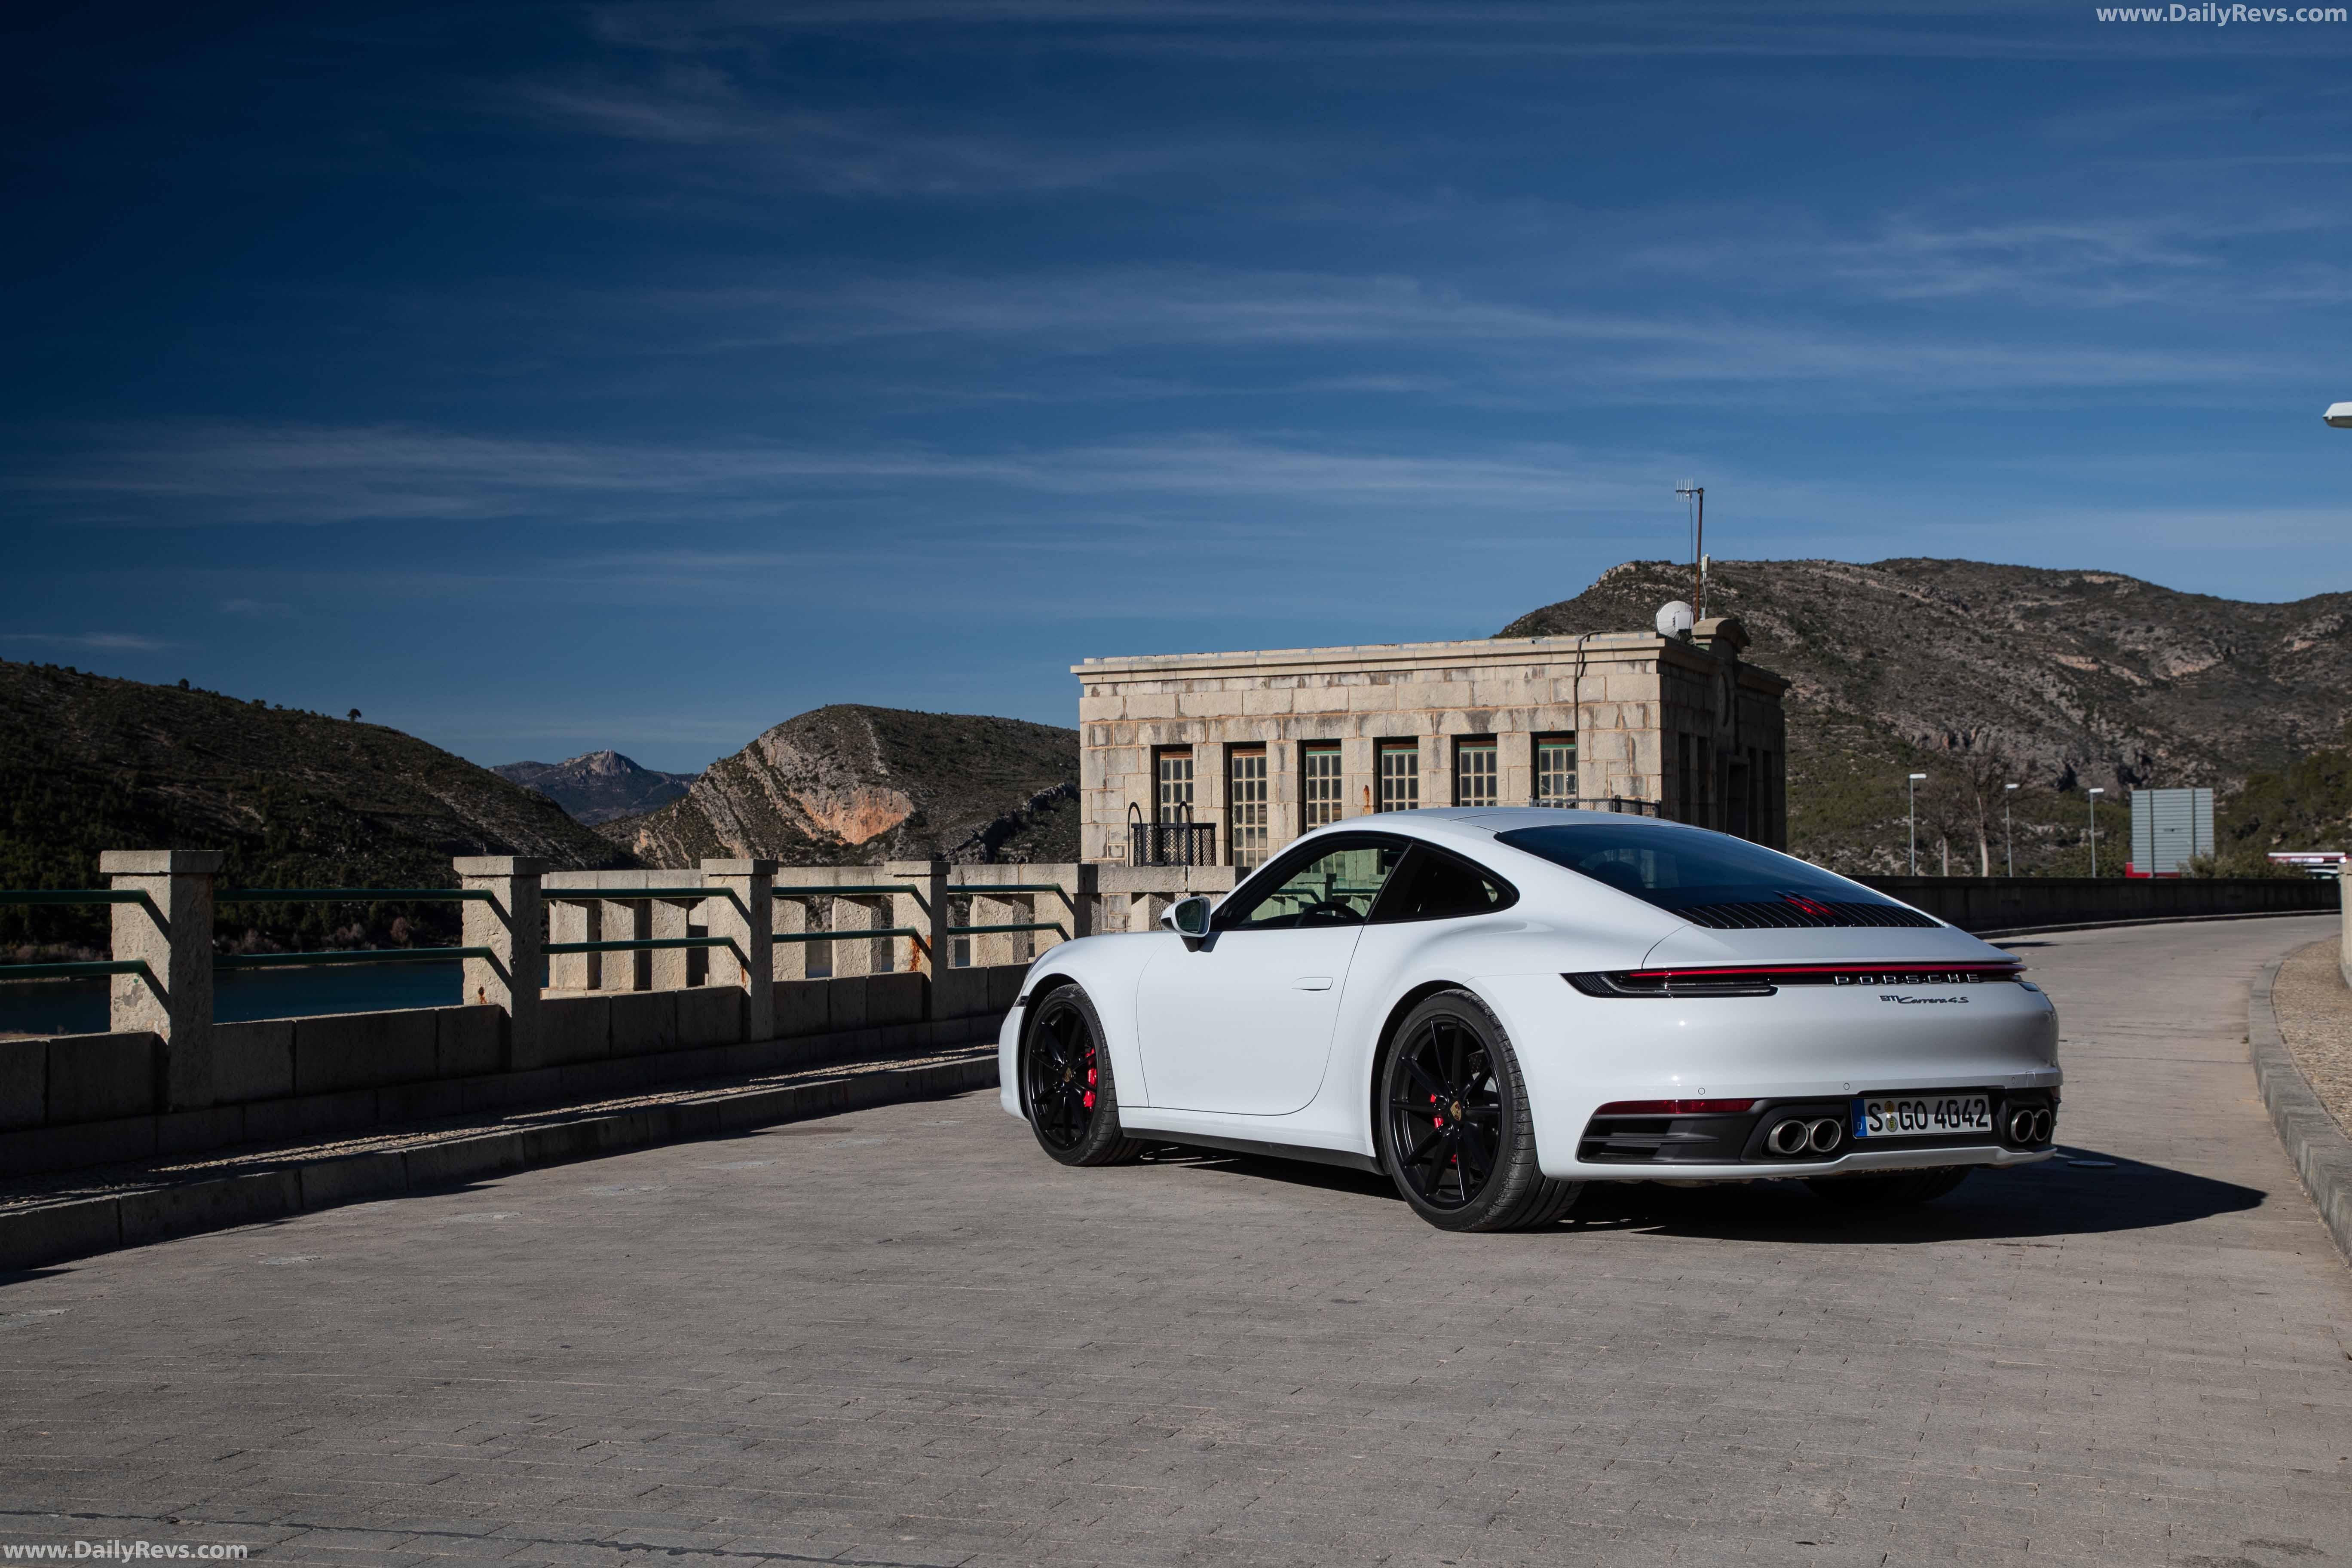 2019 Porsche 911 Carrera 4S - Carrera White Metallic - Dailyrevs